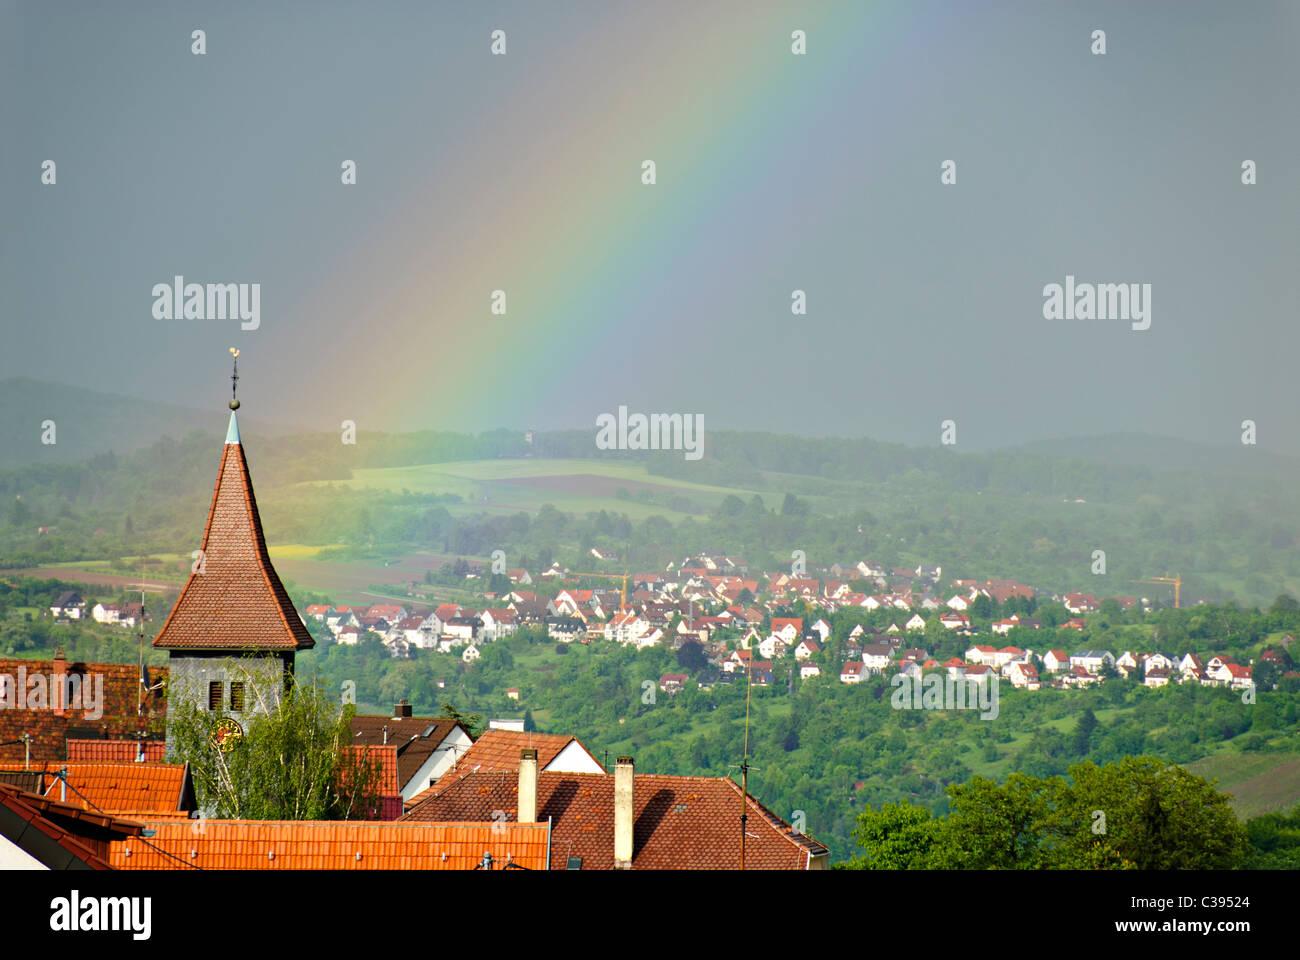 Rainbow over church, Germany, Europe - Stock Image